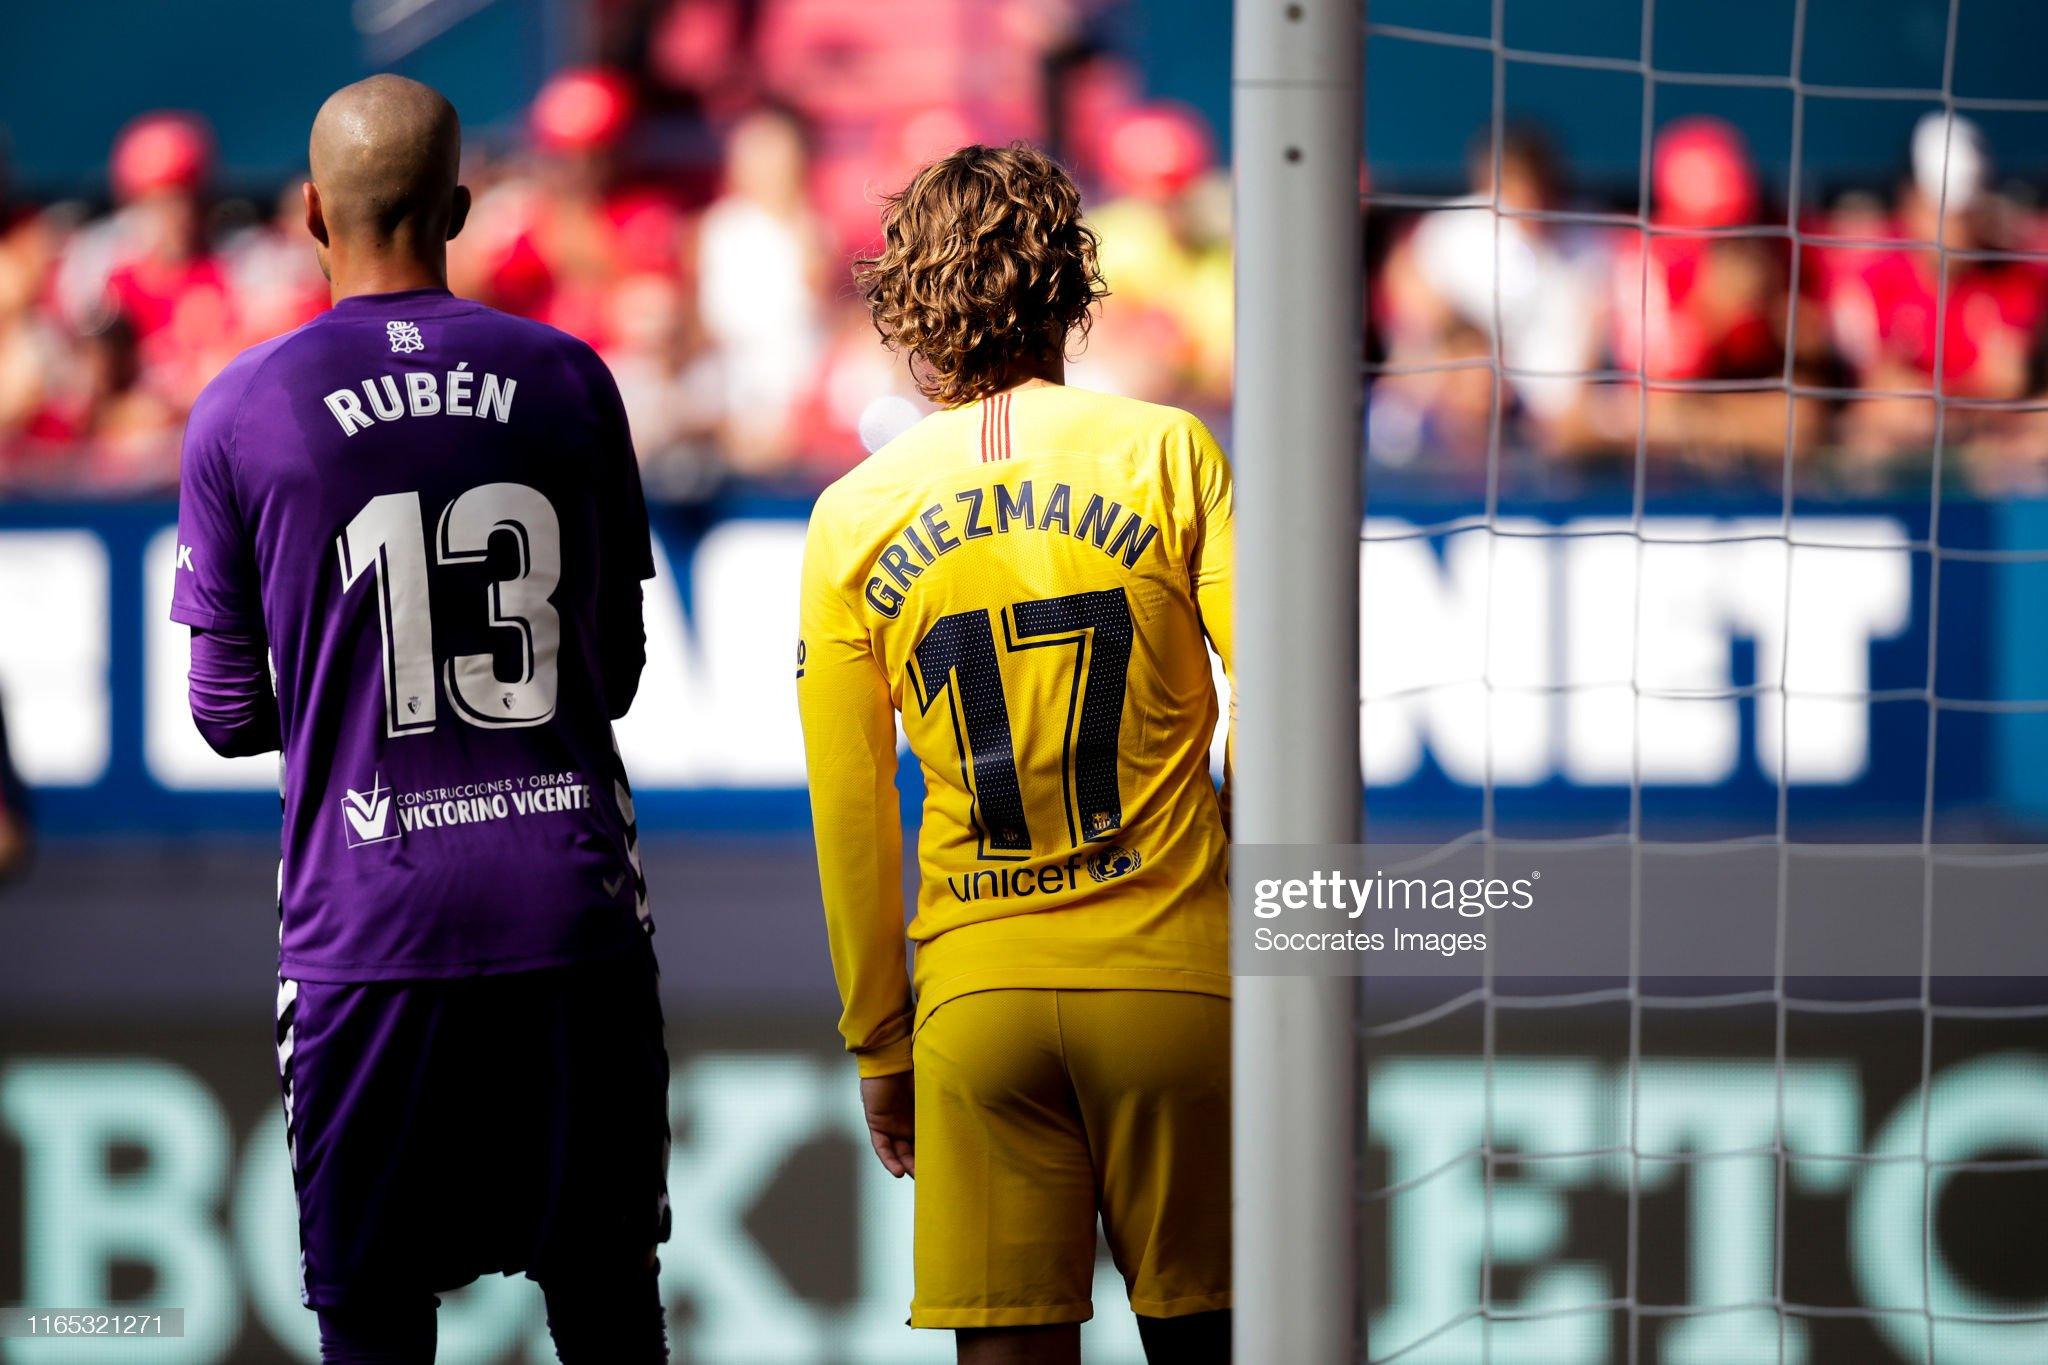 صور مباراة : أوساسونا - برشلونة 2-2 ( 31-08-2019 )  Ruben-of-ca-osasuna-antoine-griezmann-of-fc-barcelona-during-the-la-picture-id1165321271?s=2048x2048